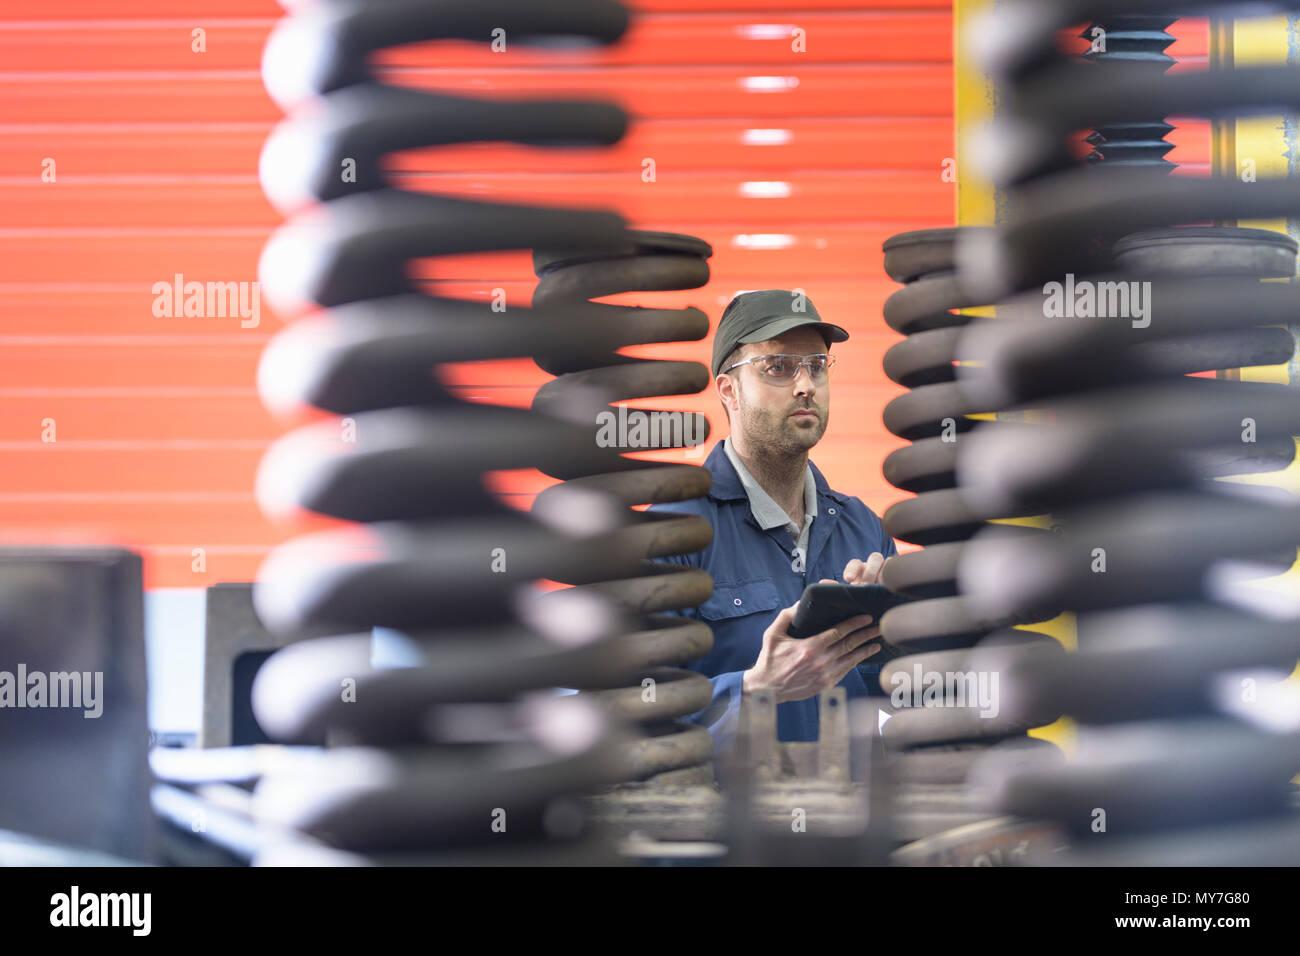 Engineer inspecting springs in train engineering factory - Stock Image